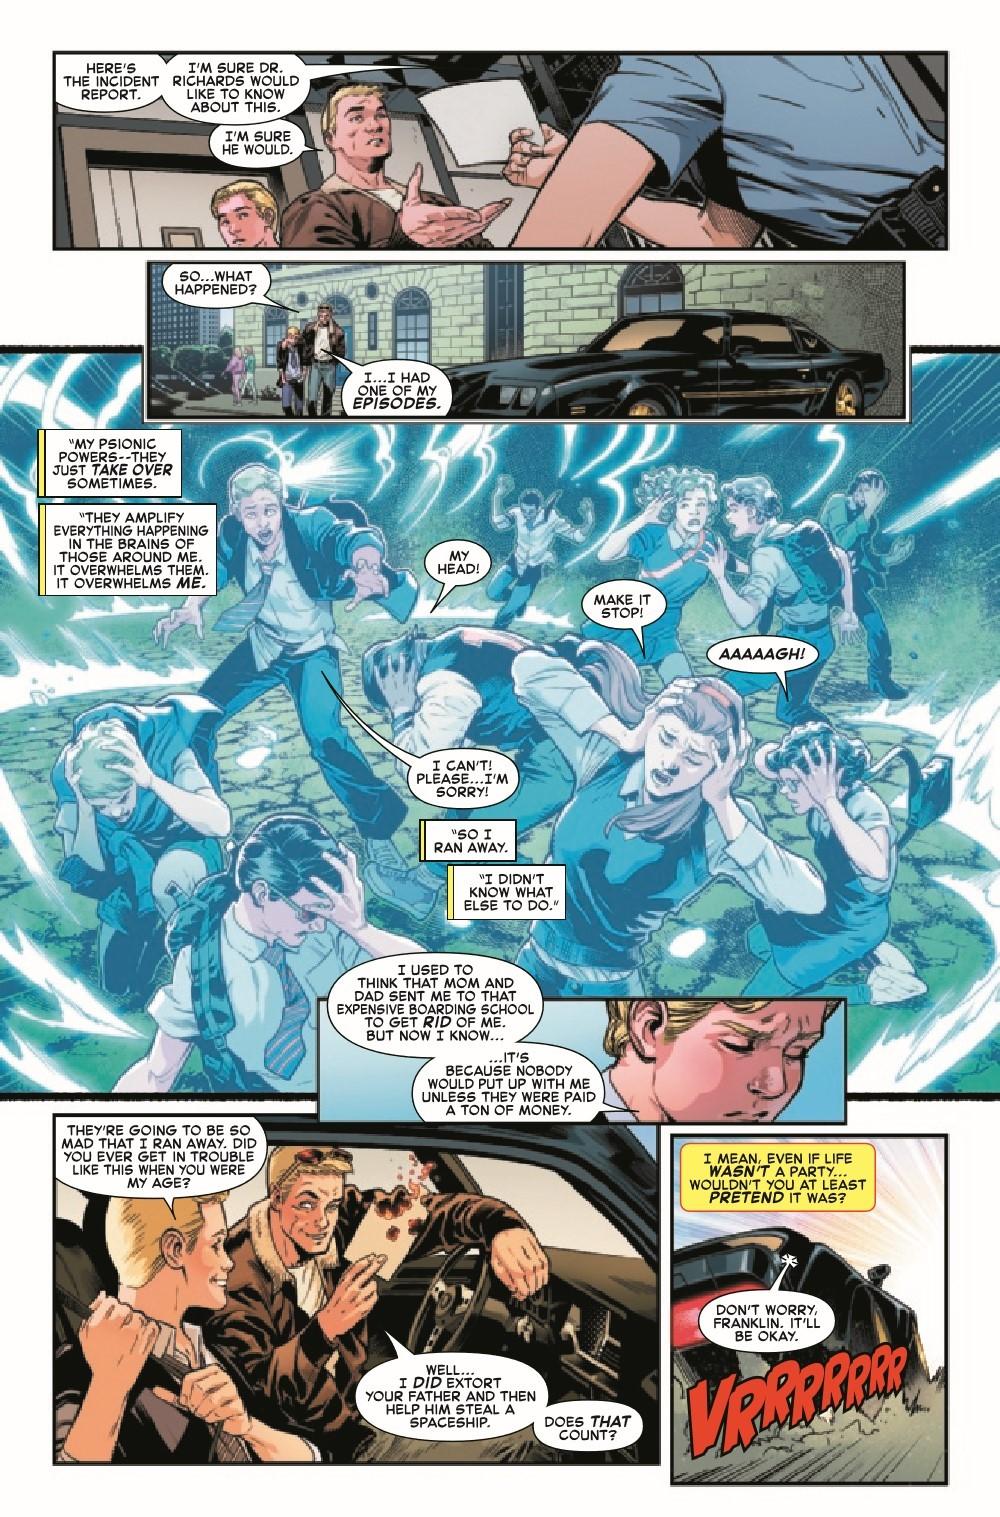 FFLIFESTORY2019003_Preview-4 ComicList Previews: FANTASTIC FOUR LIFE STORY #3 (OF 6)